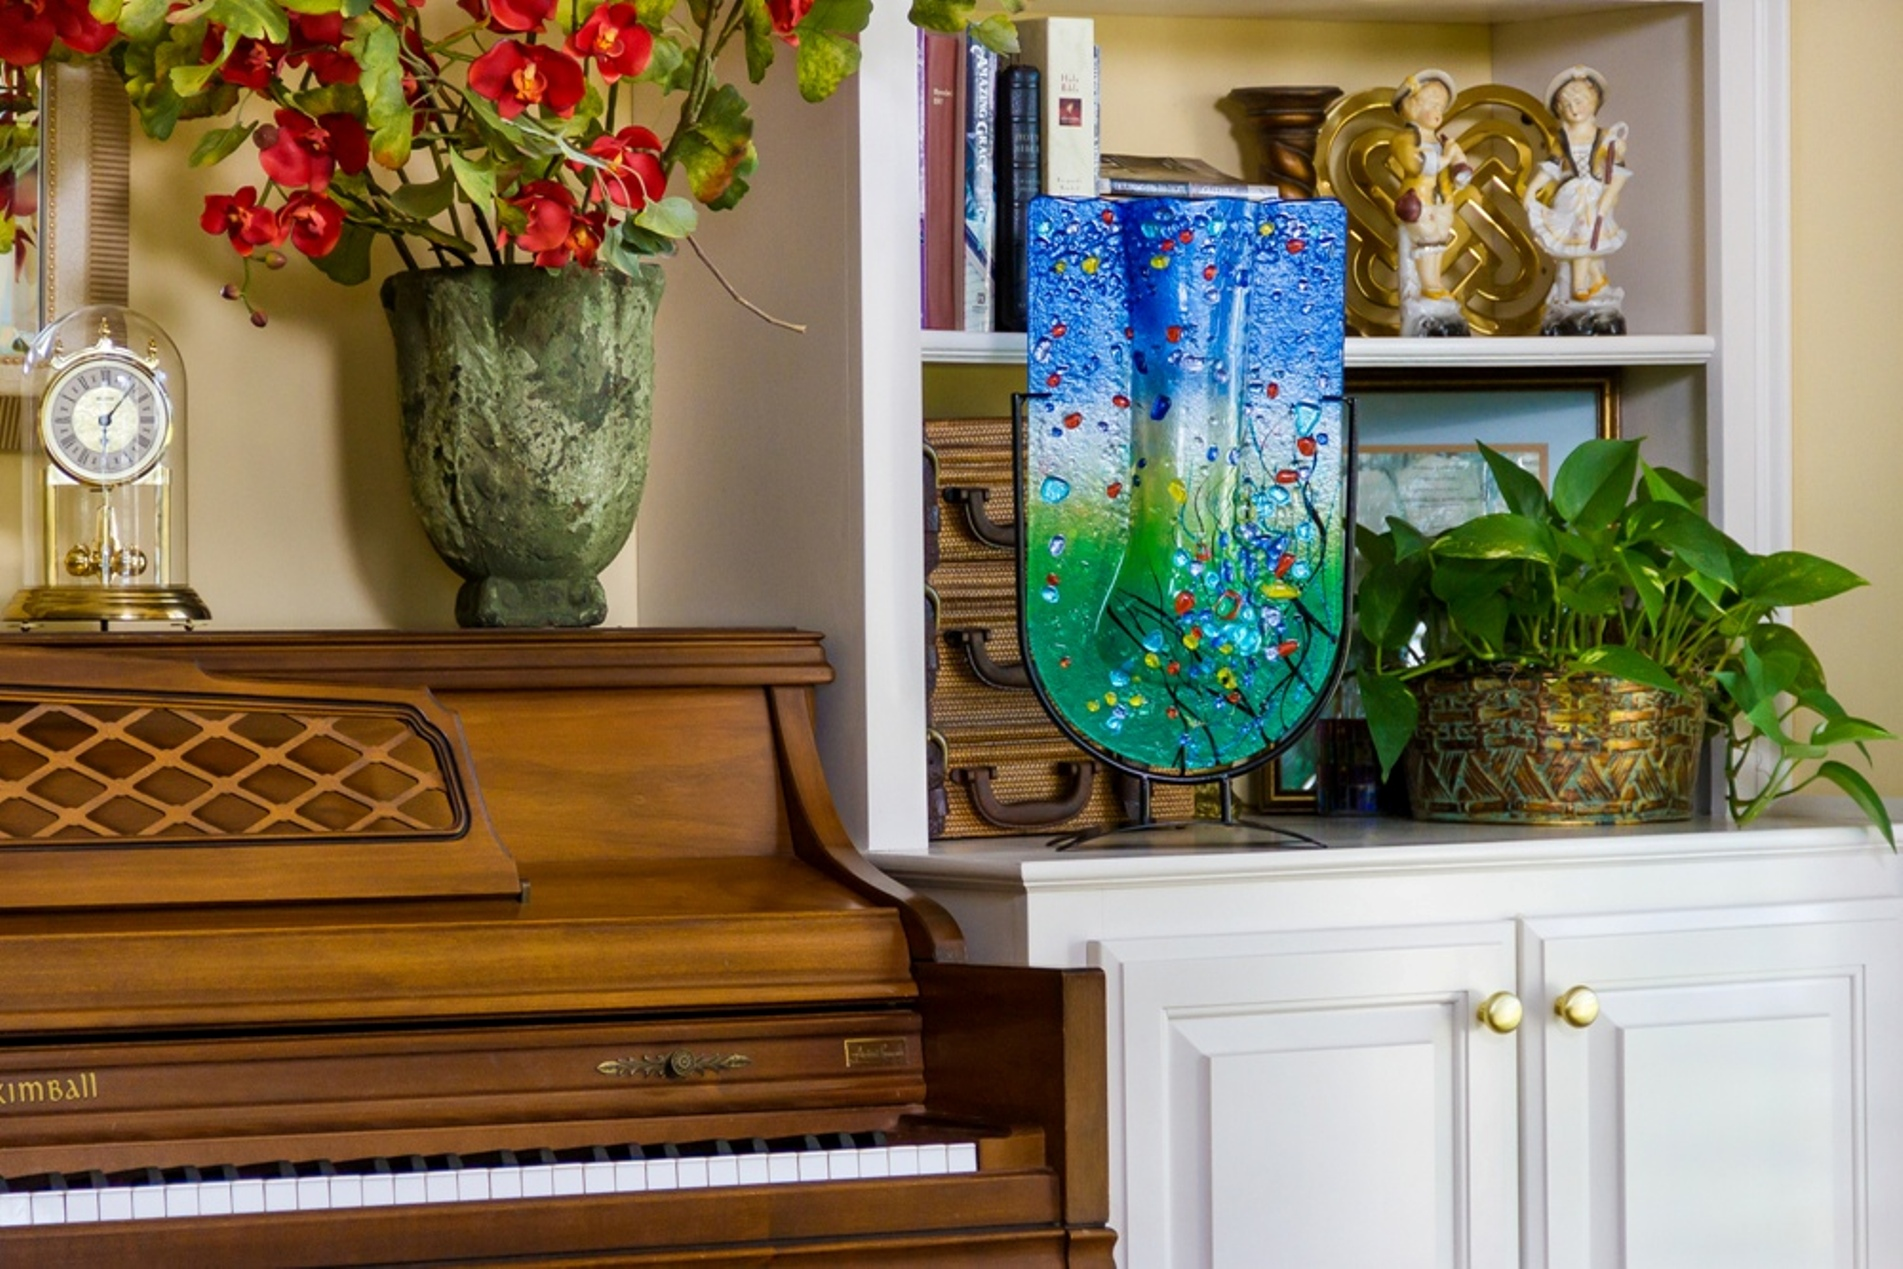 l and vases ikea barrel bowls home crate glass ceramic decor lighting decorative